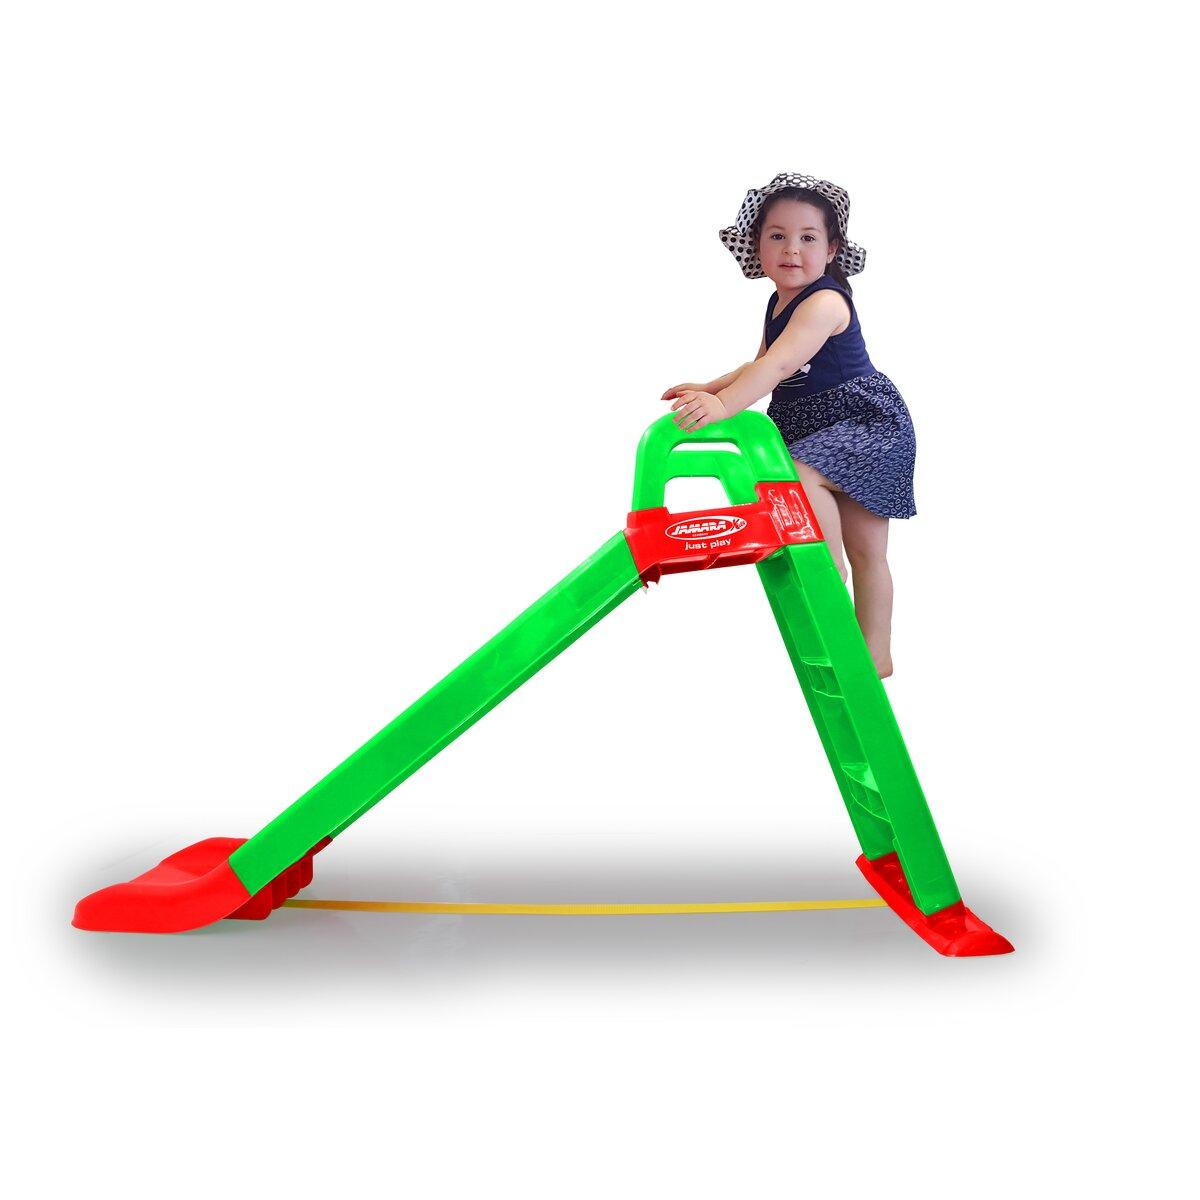 Jamara Skluzavka Funny Slide zelená